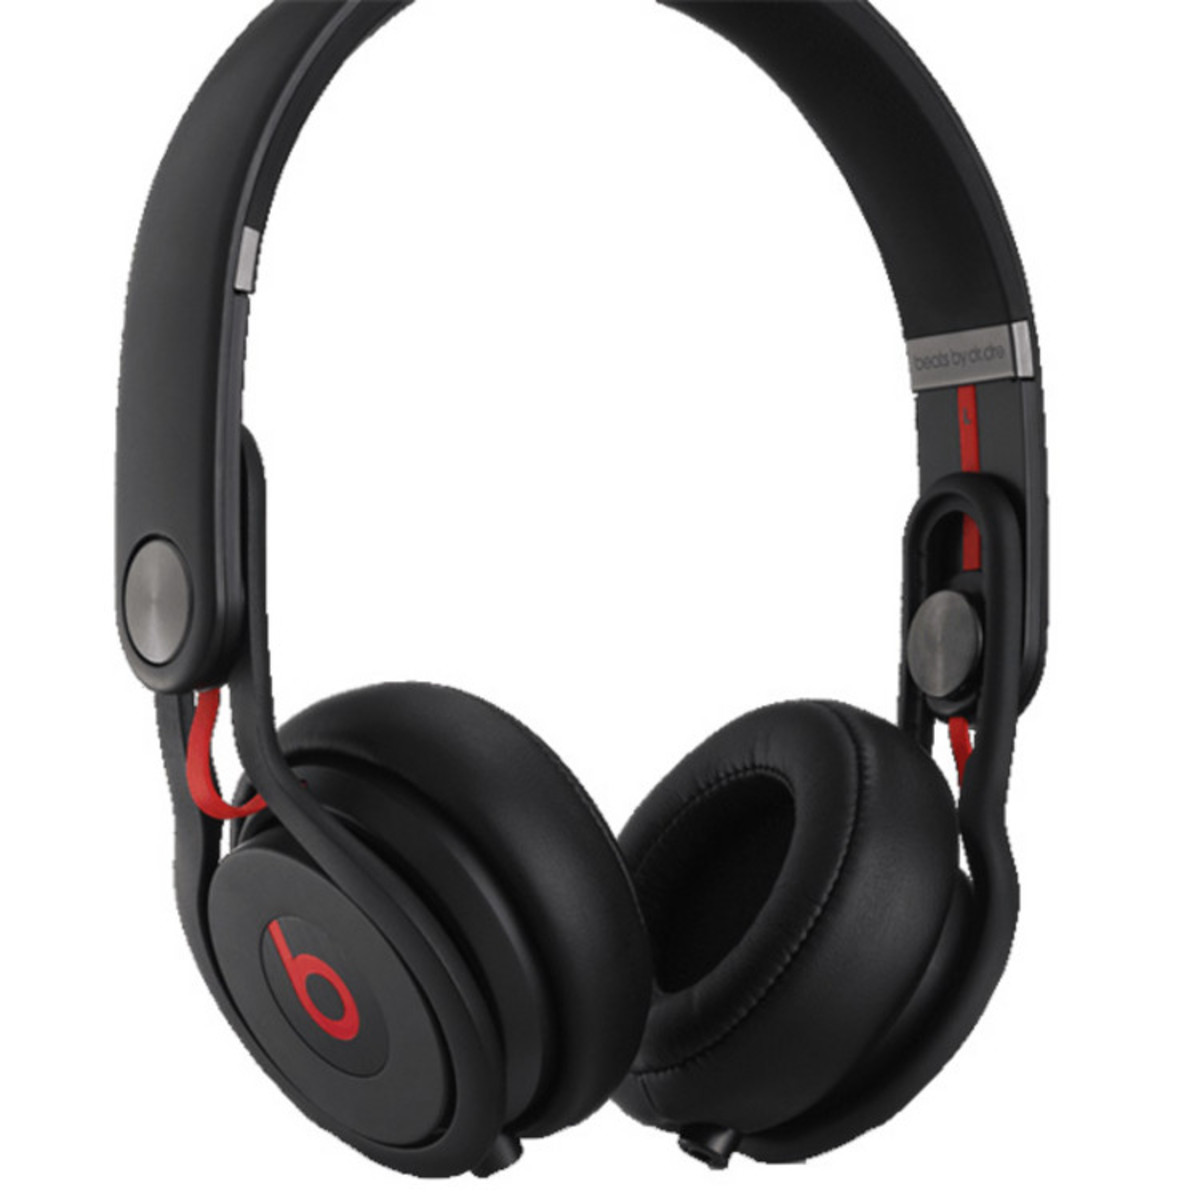 Beats Mixr Auriculares Supraurales Negro Gear4music